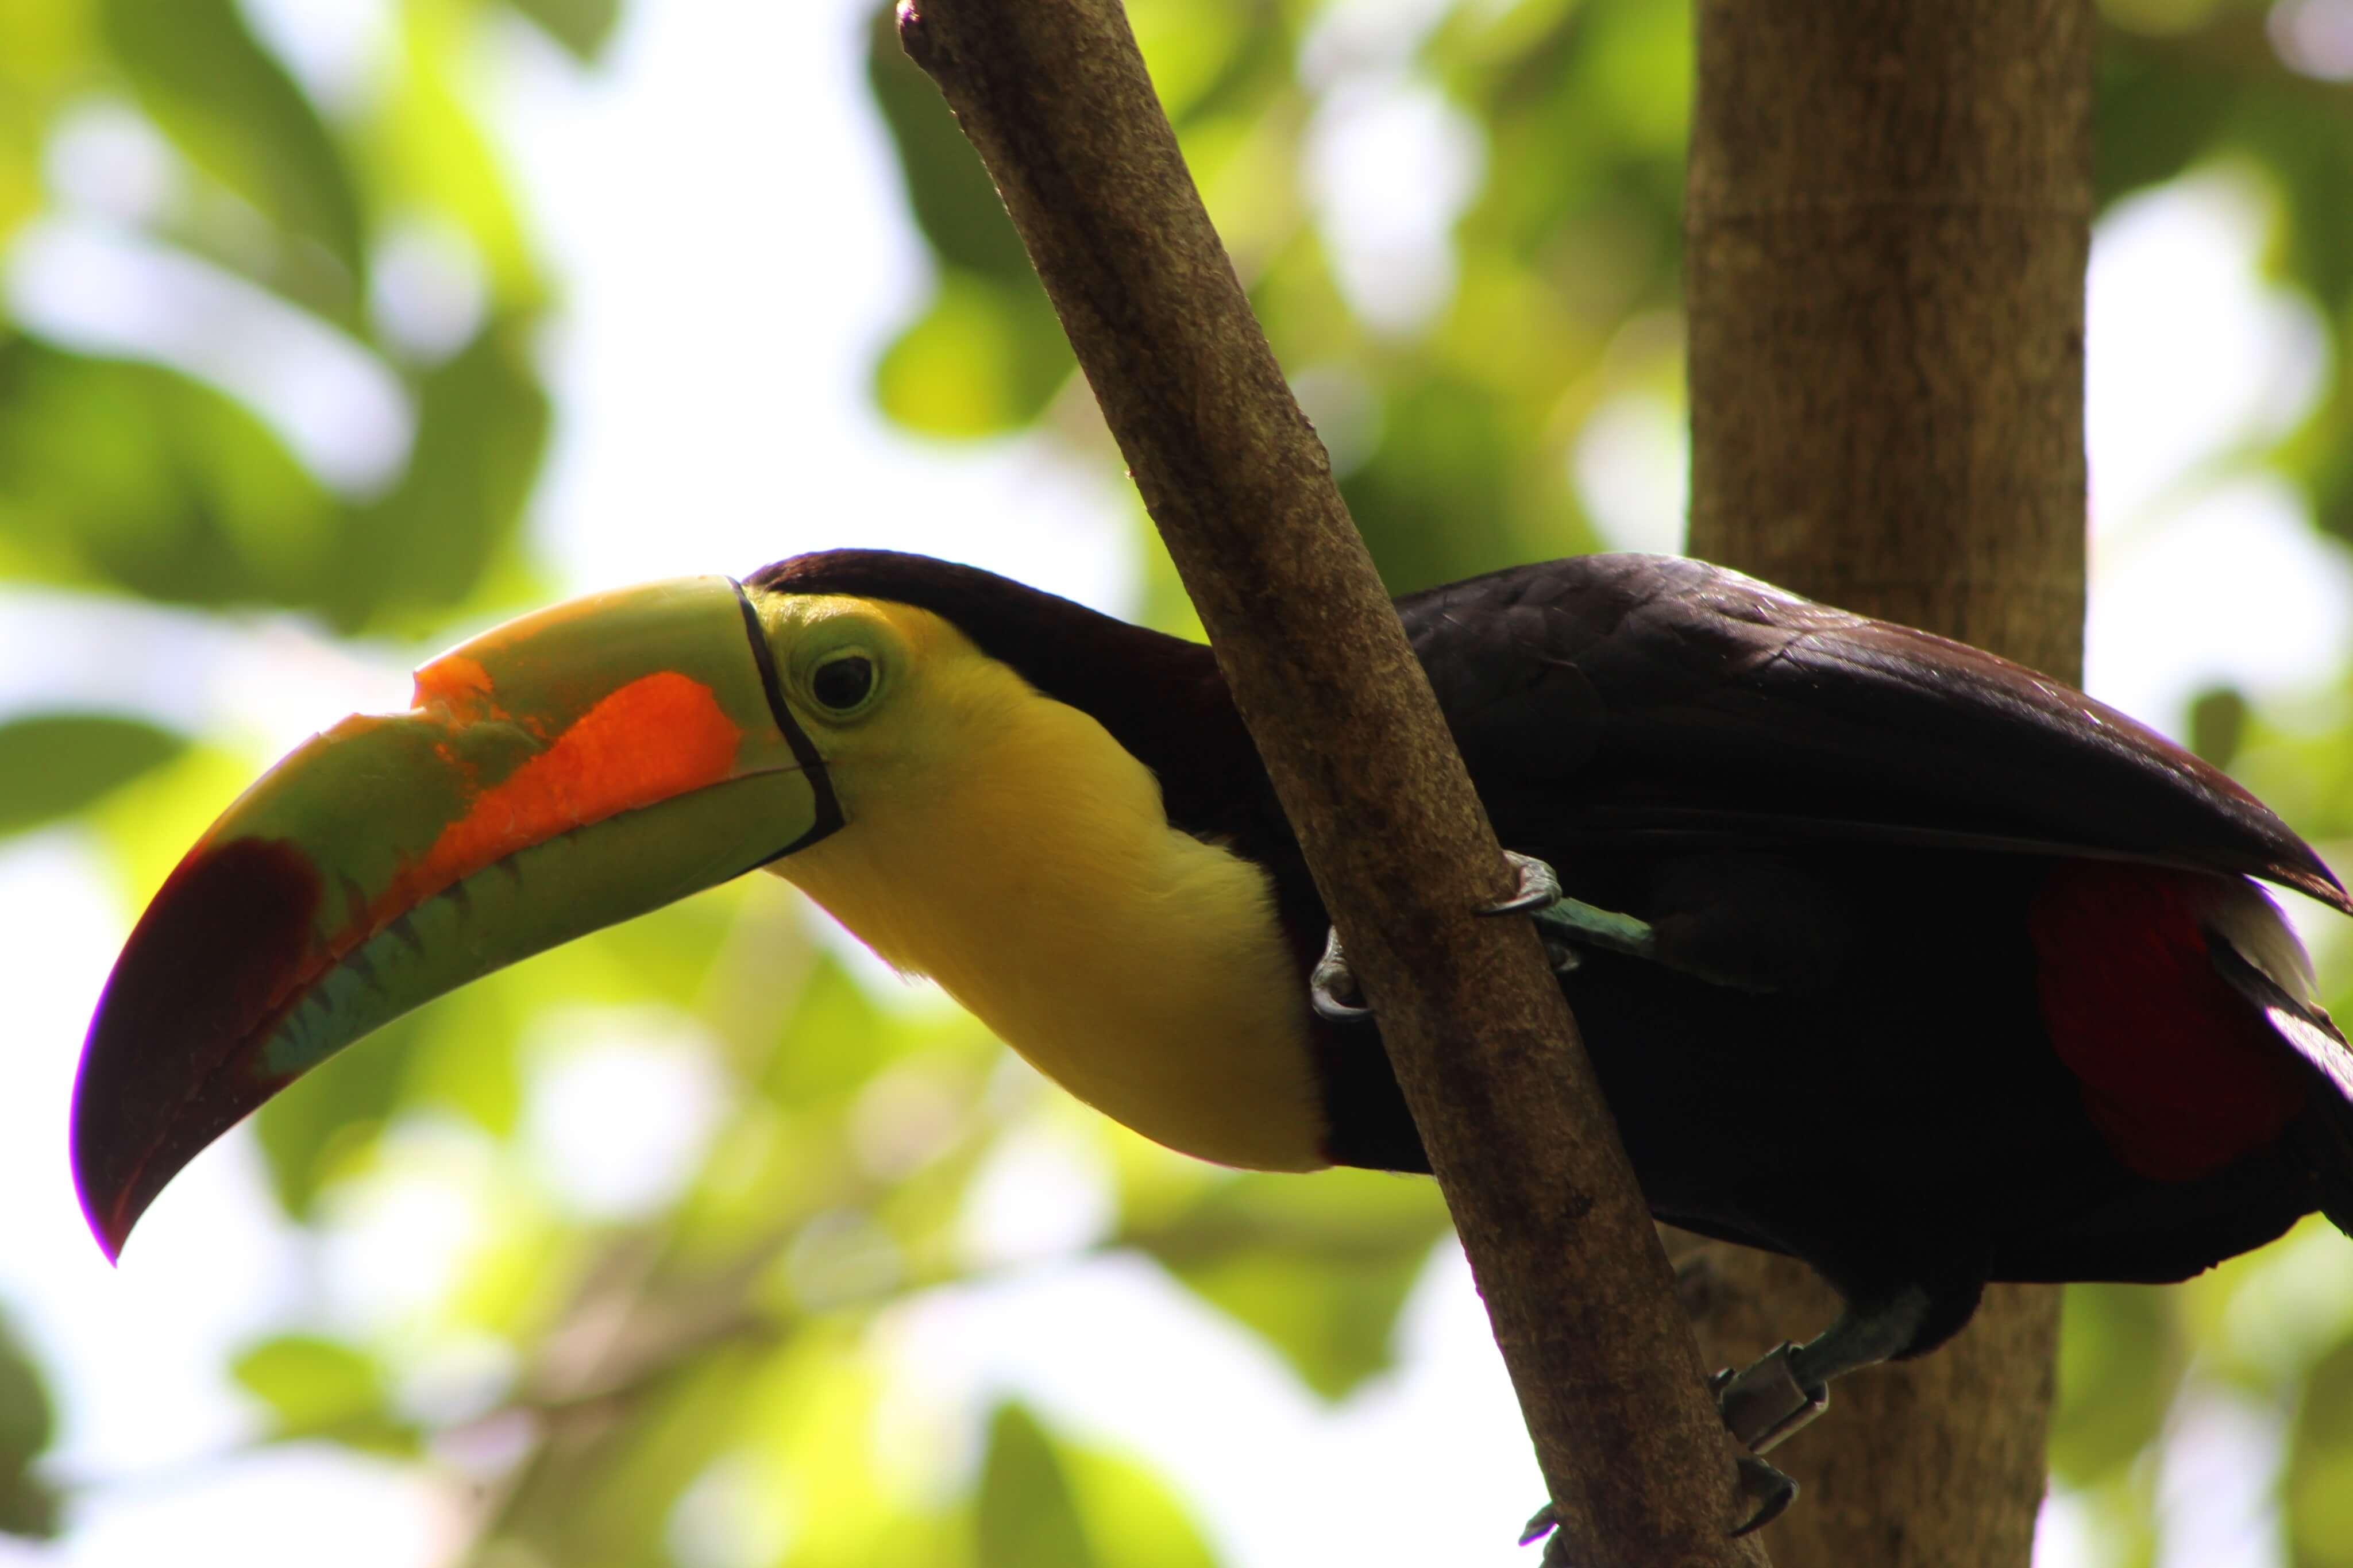 Gabrielle Ferrara: Brie's Art: Toucan, Costa Rica, photography, nature photography